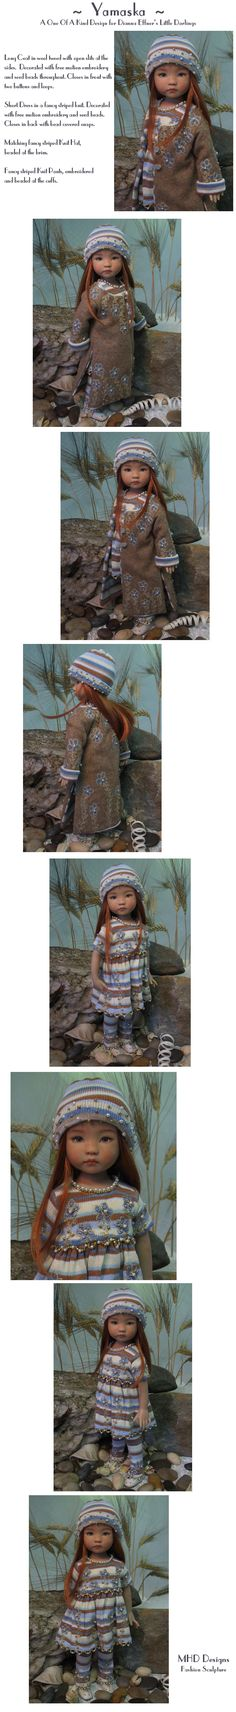 "MHD Designs ""Yamaska"" for Dianna Effner's Little Darlings"